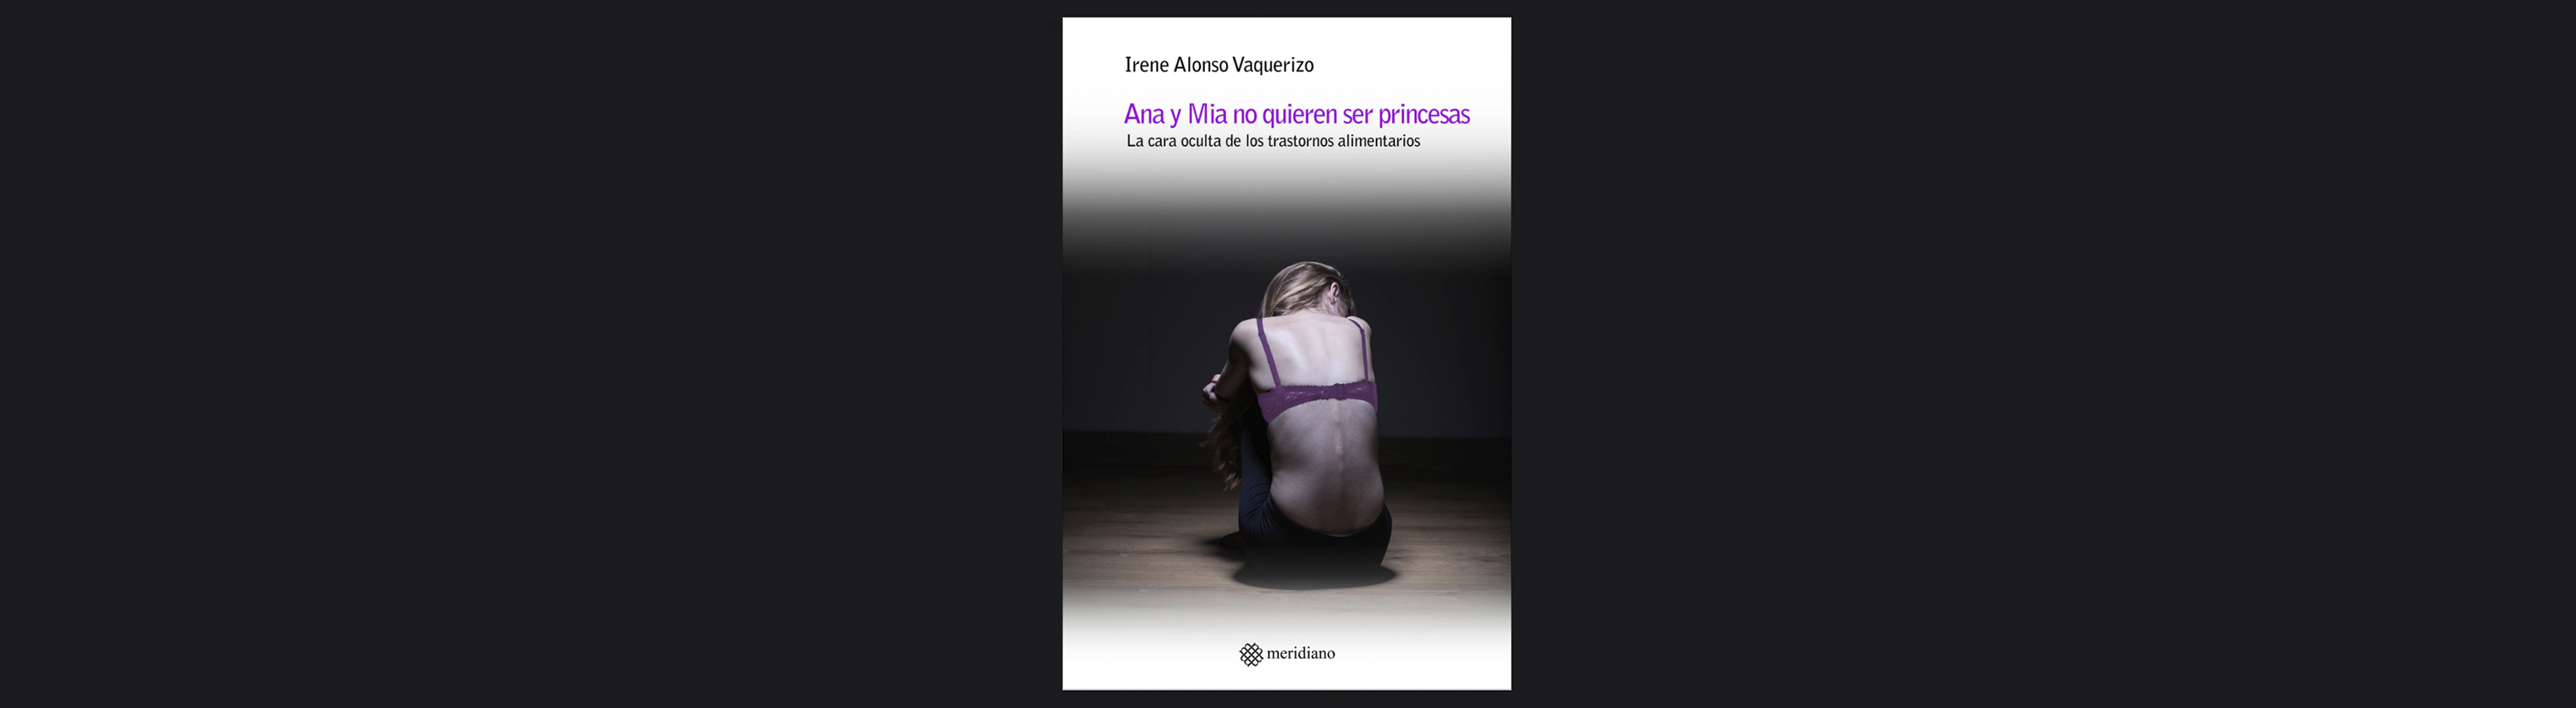 Irene Alonso Vaquerizo